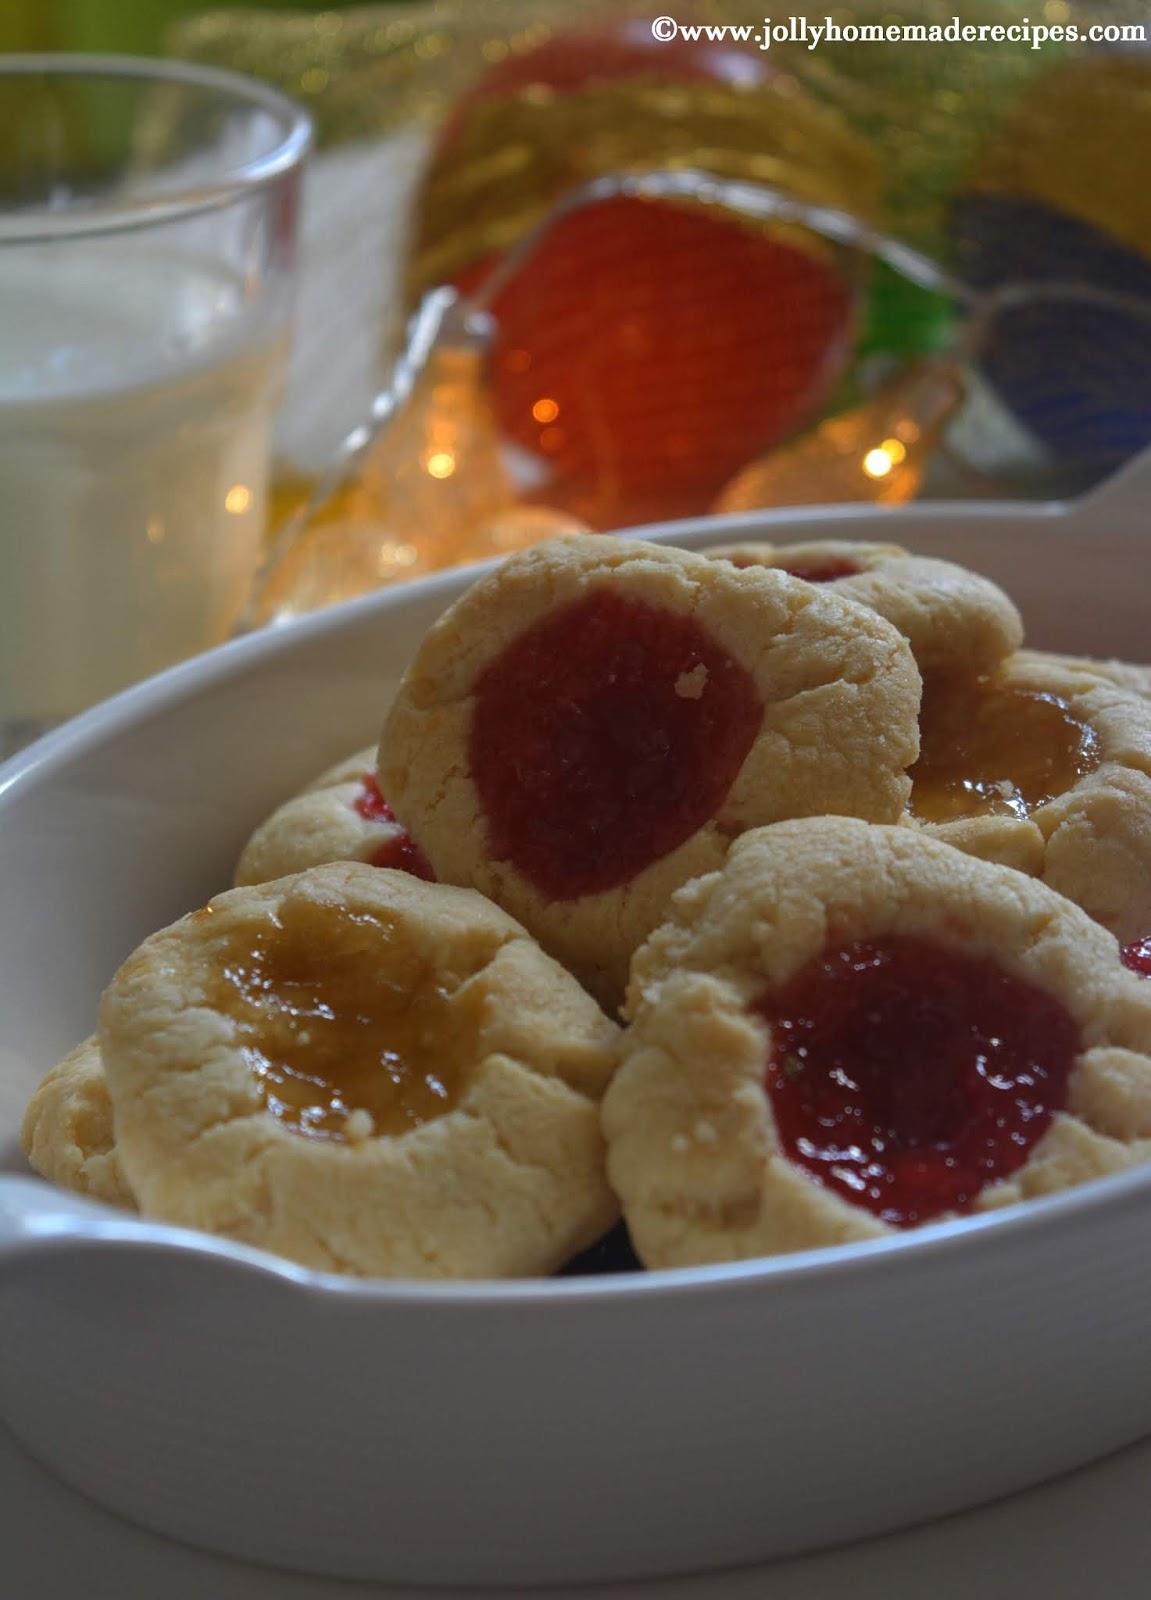 Shortbread Jam Thumbprint Cookies, How to make Jam Thumbprint Cookies | Eggless Thumbprint Cookies